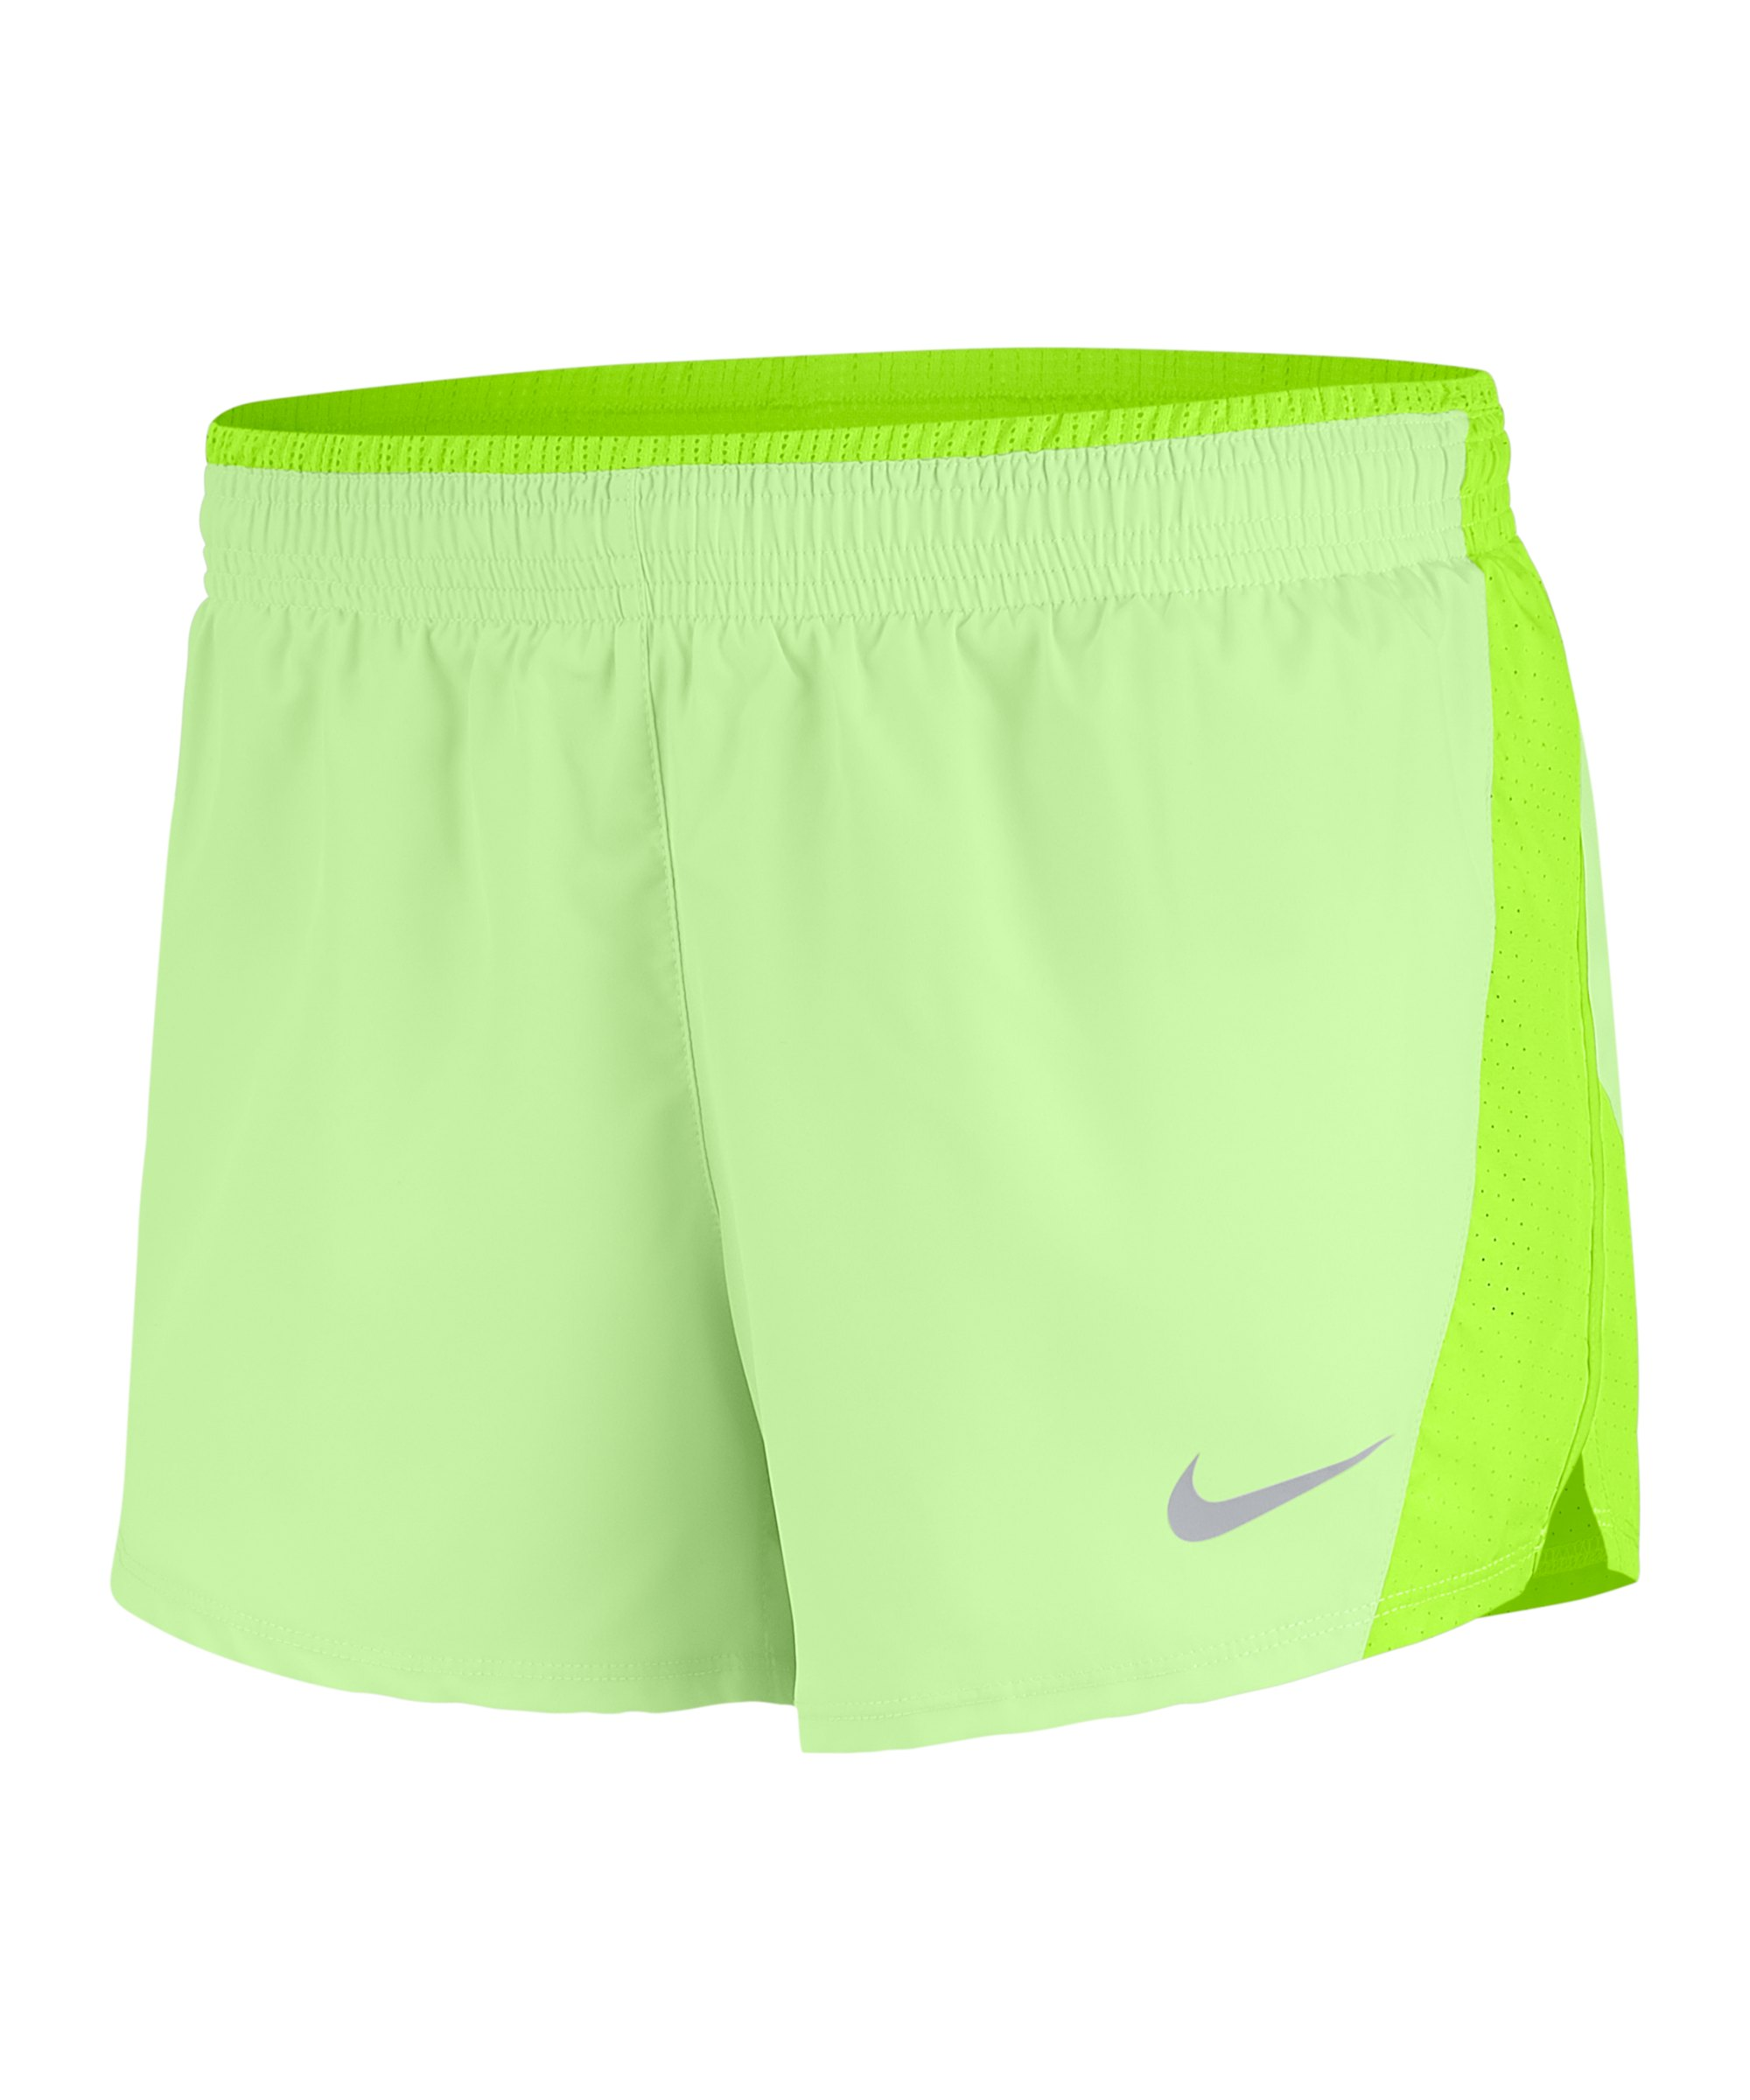 Nike 10K Short Running Damen Grün F701 - gruen